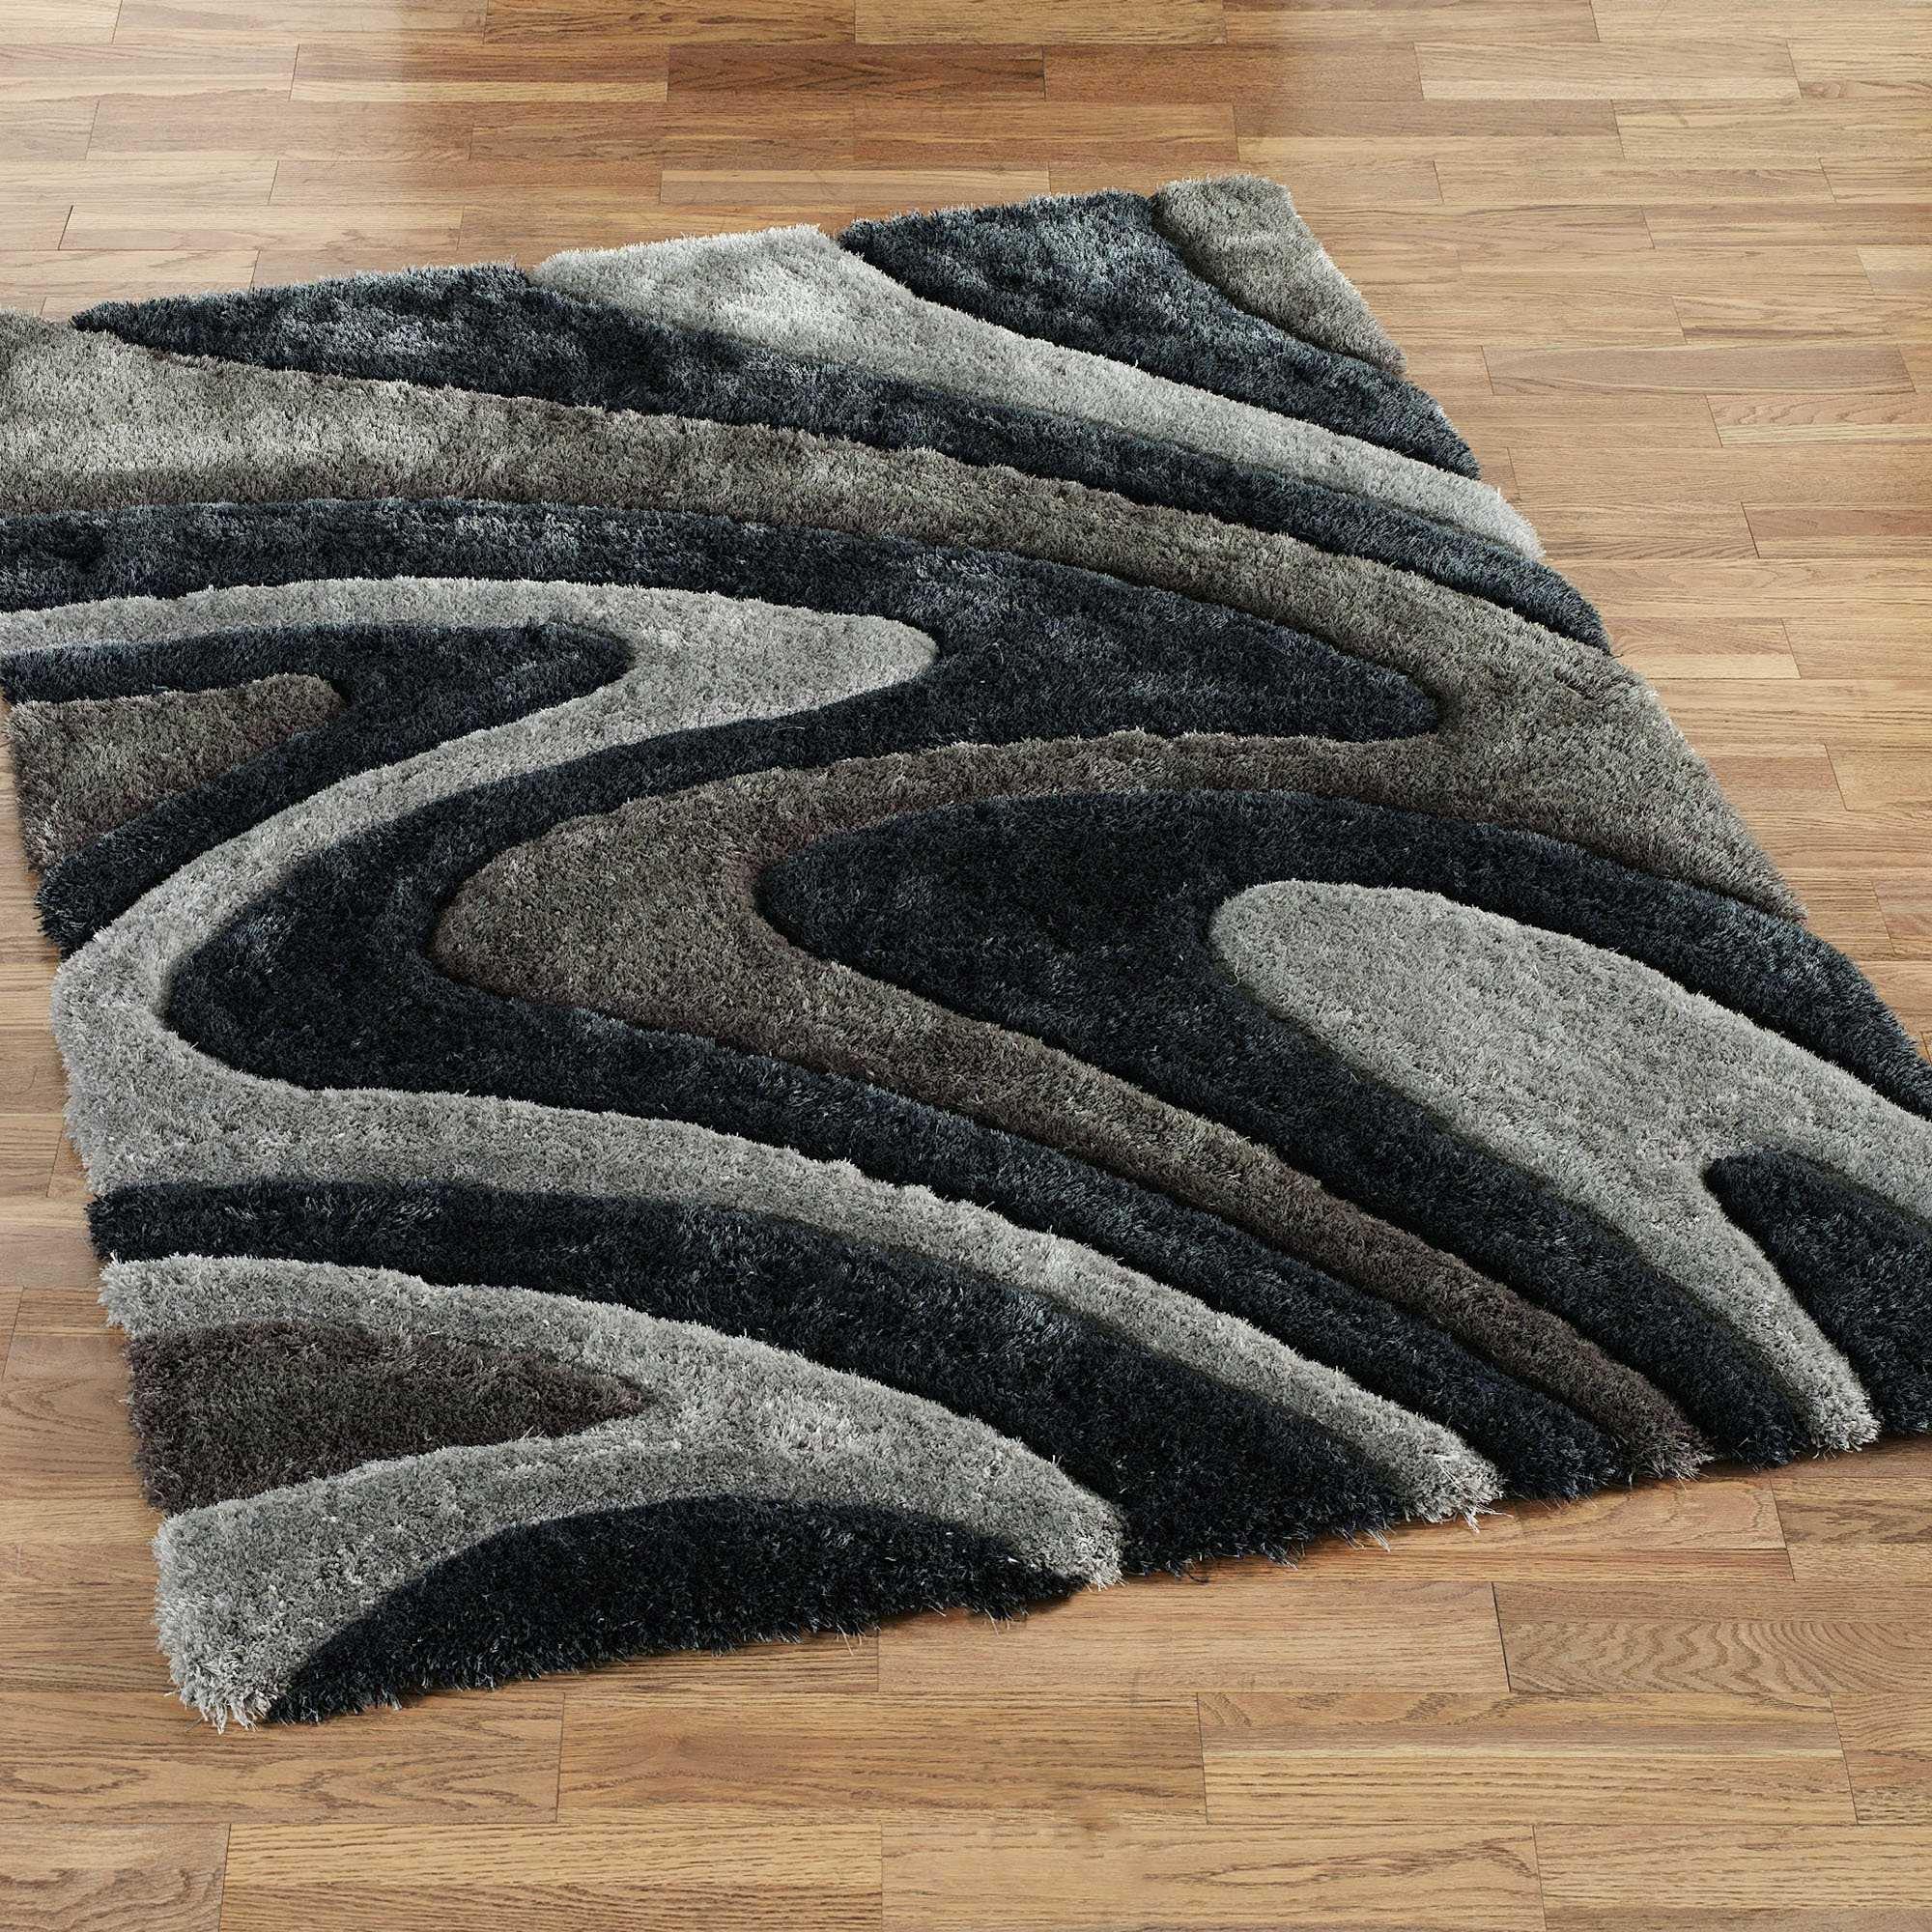 15 Photo Of Wool Shag Area Rugs